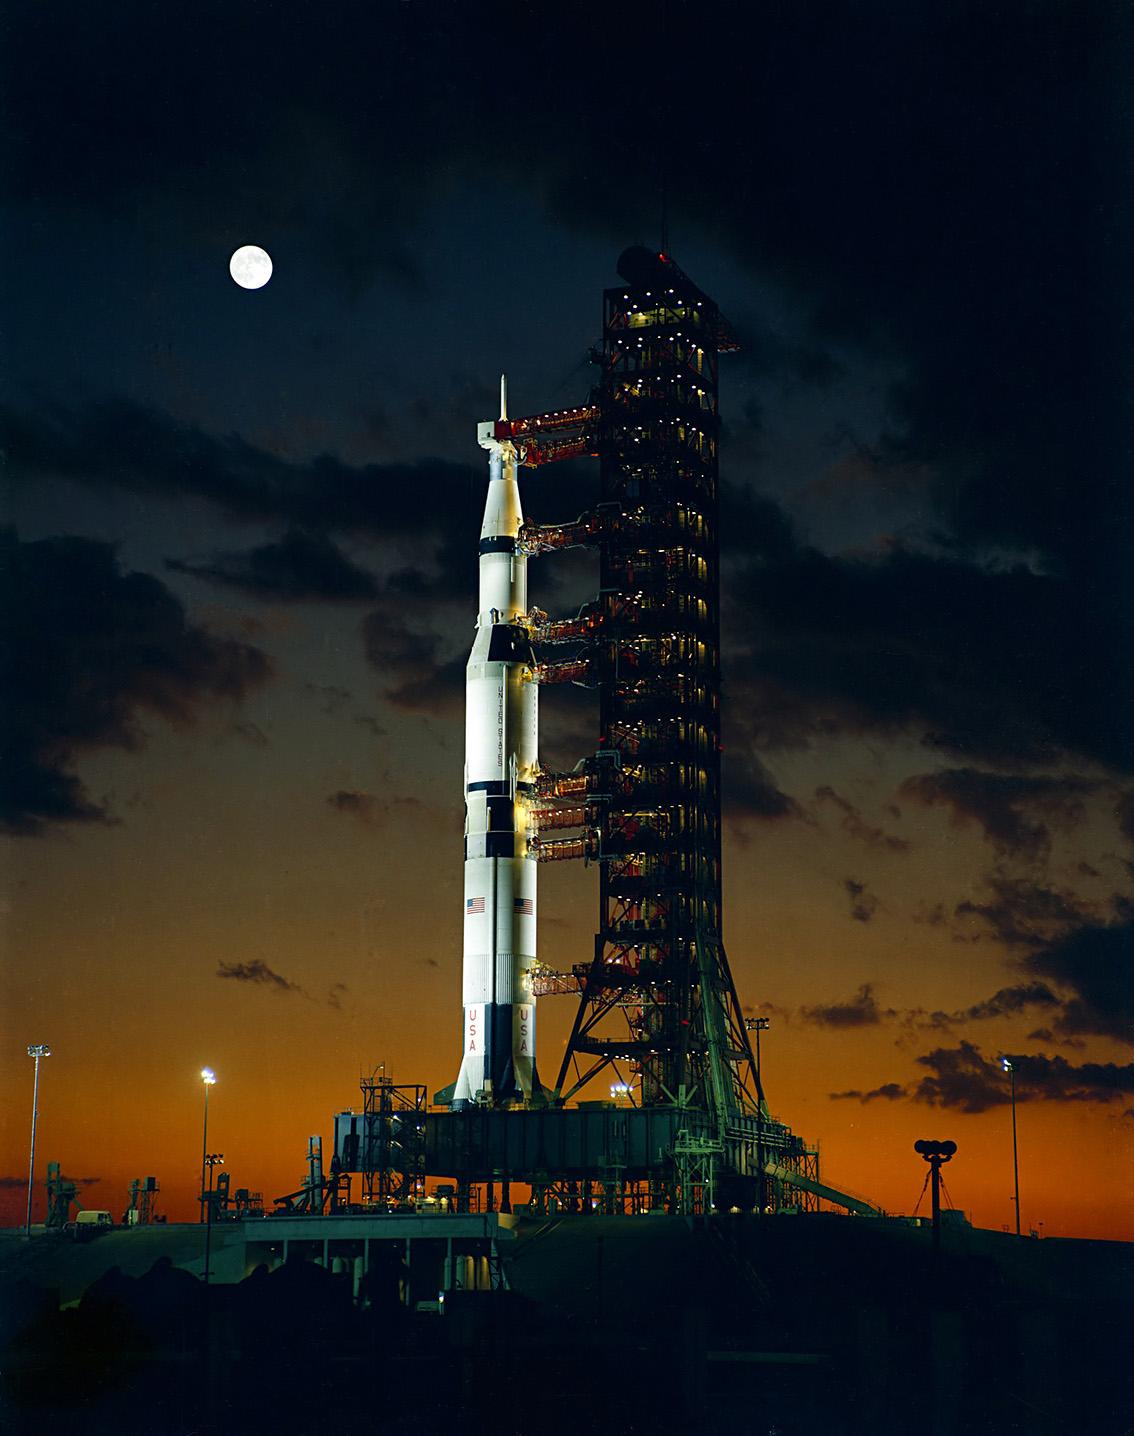 Apollo_4_Saturn_V_nov67